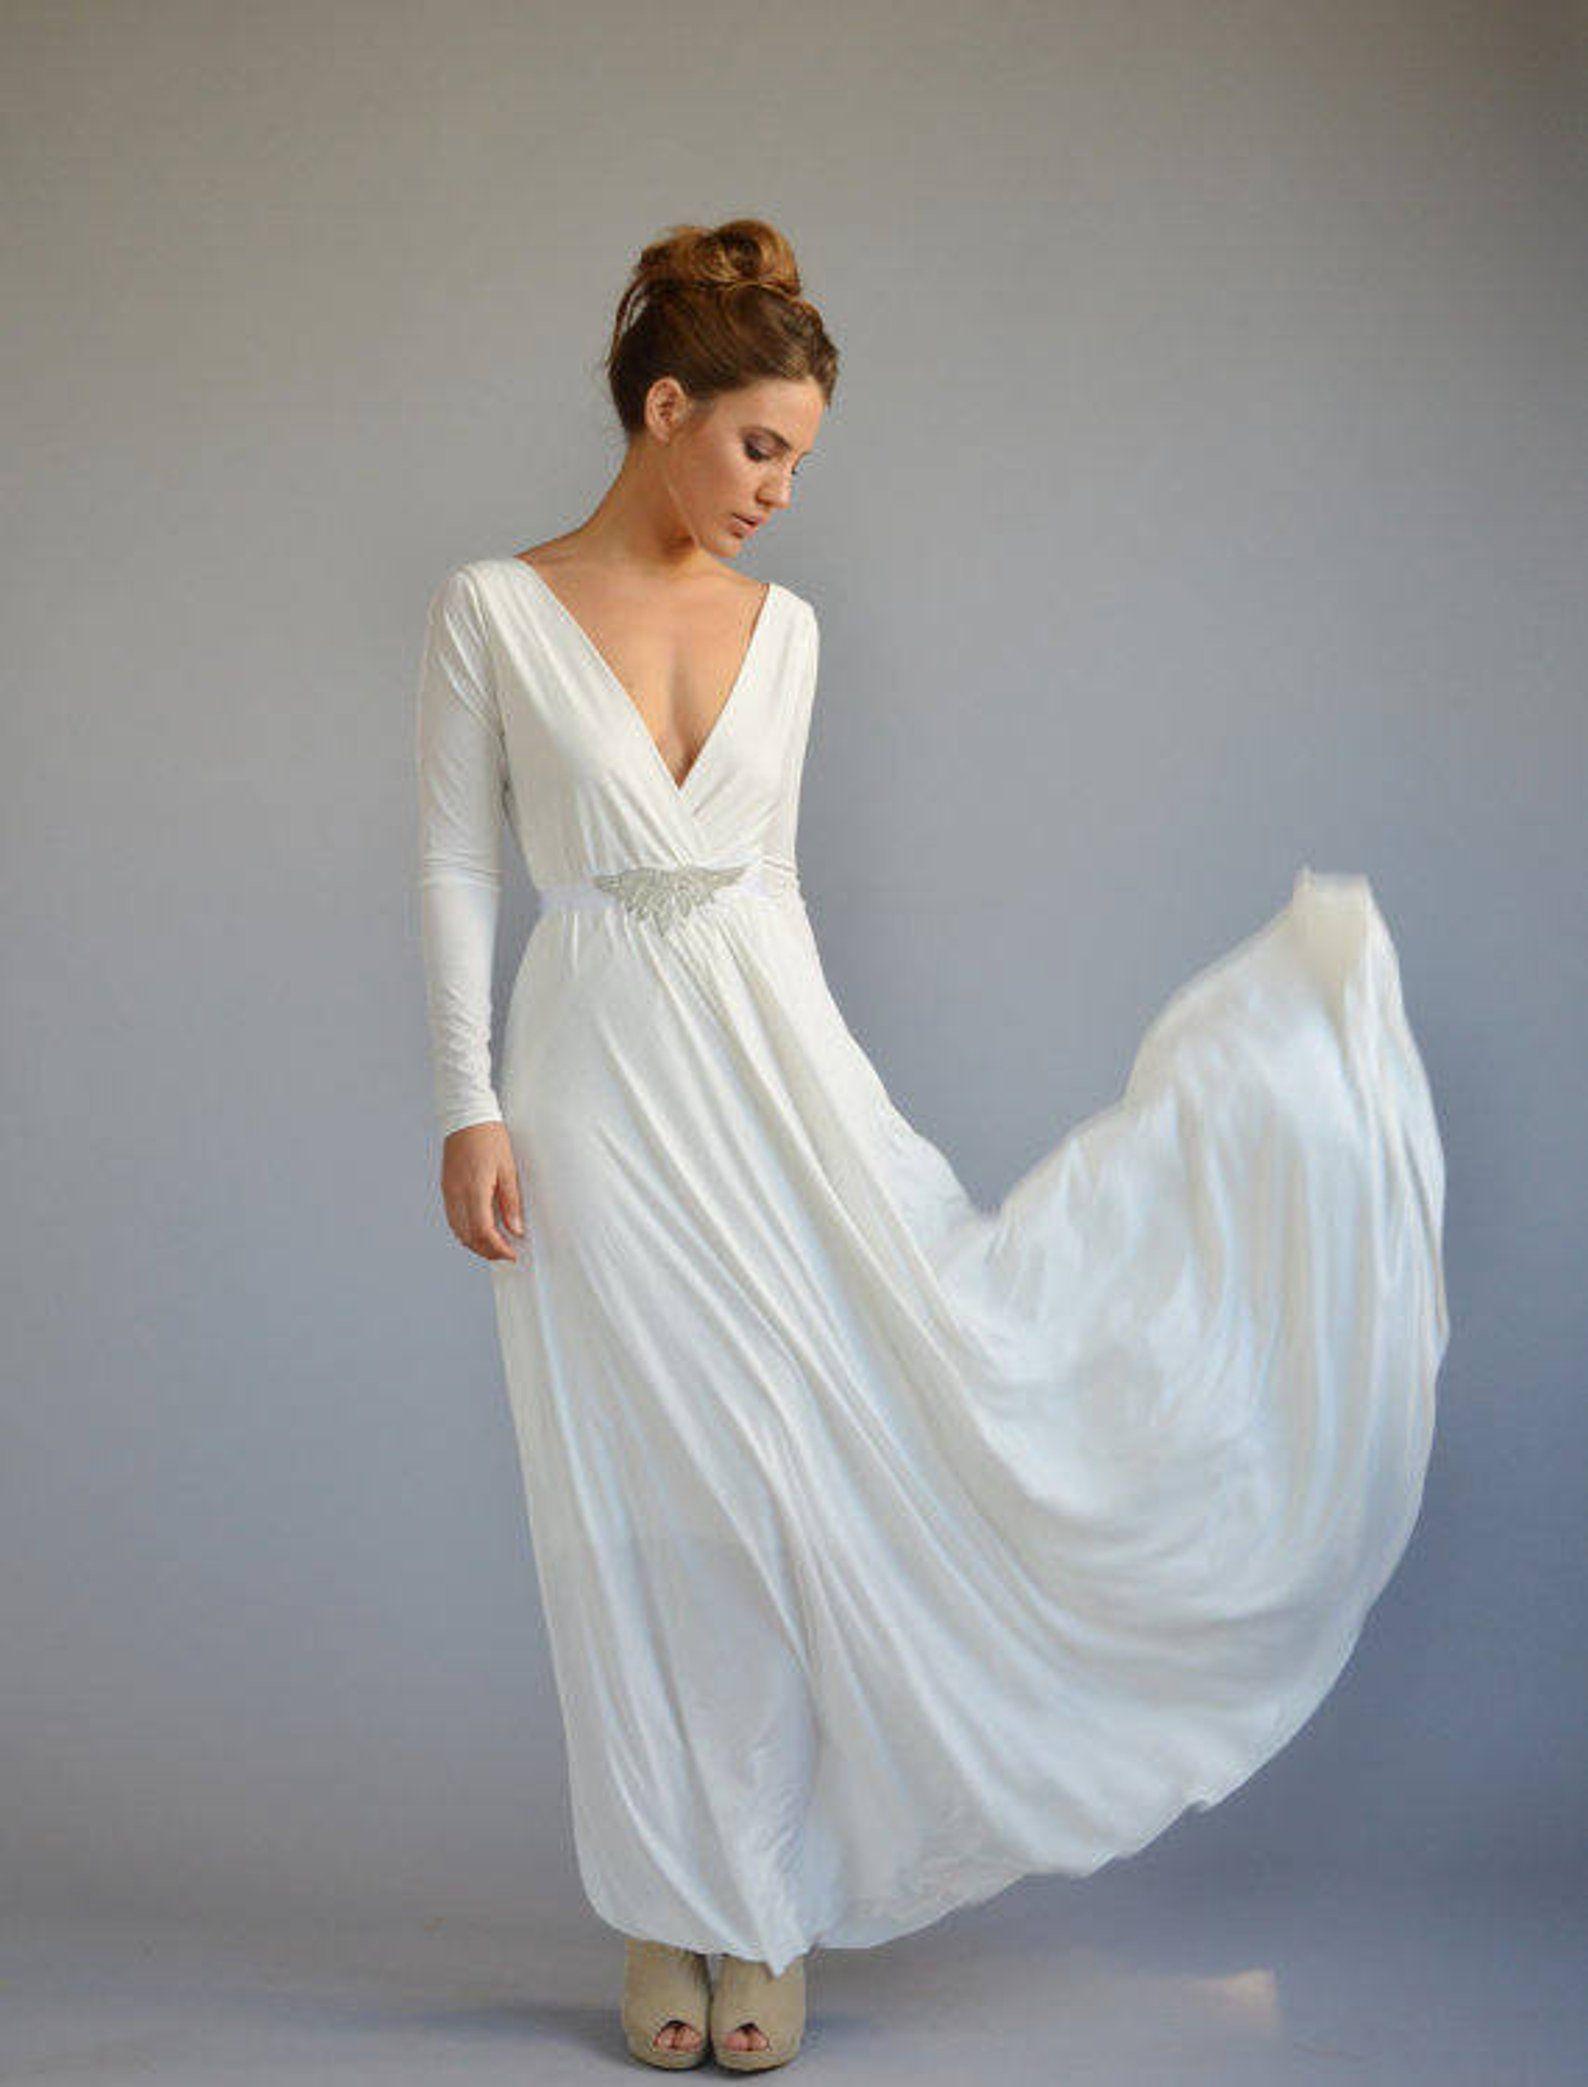 23+ V neck wedding dress necklace ideas in 2021